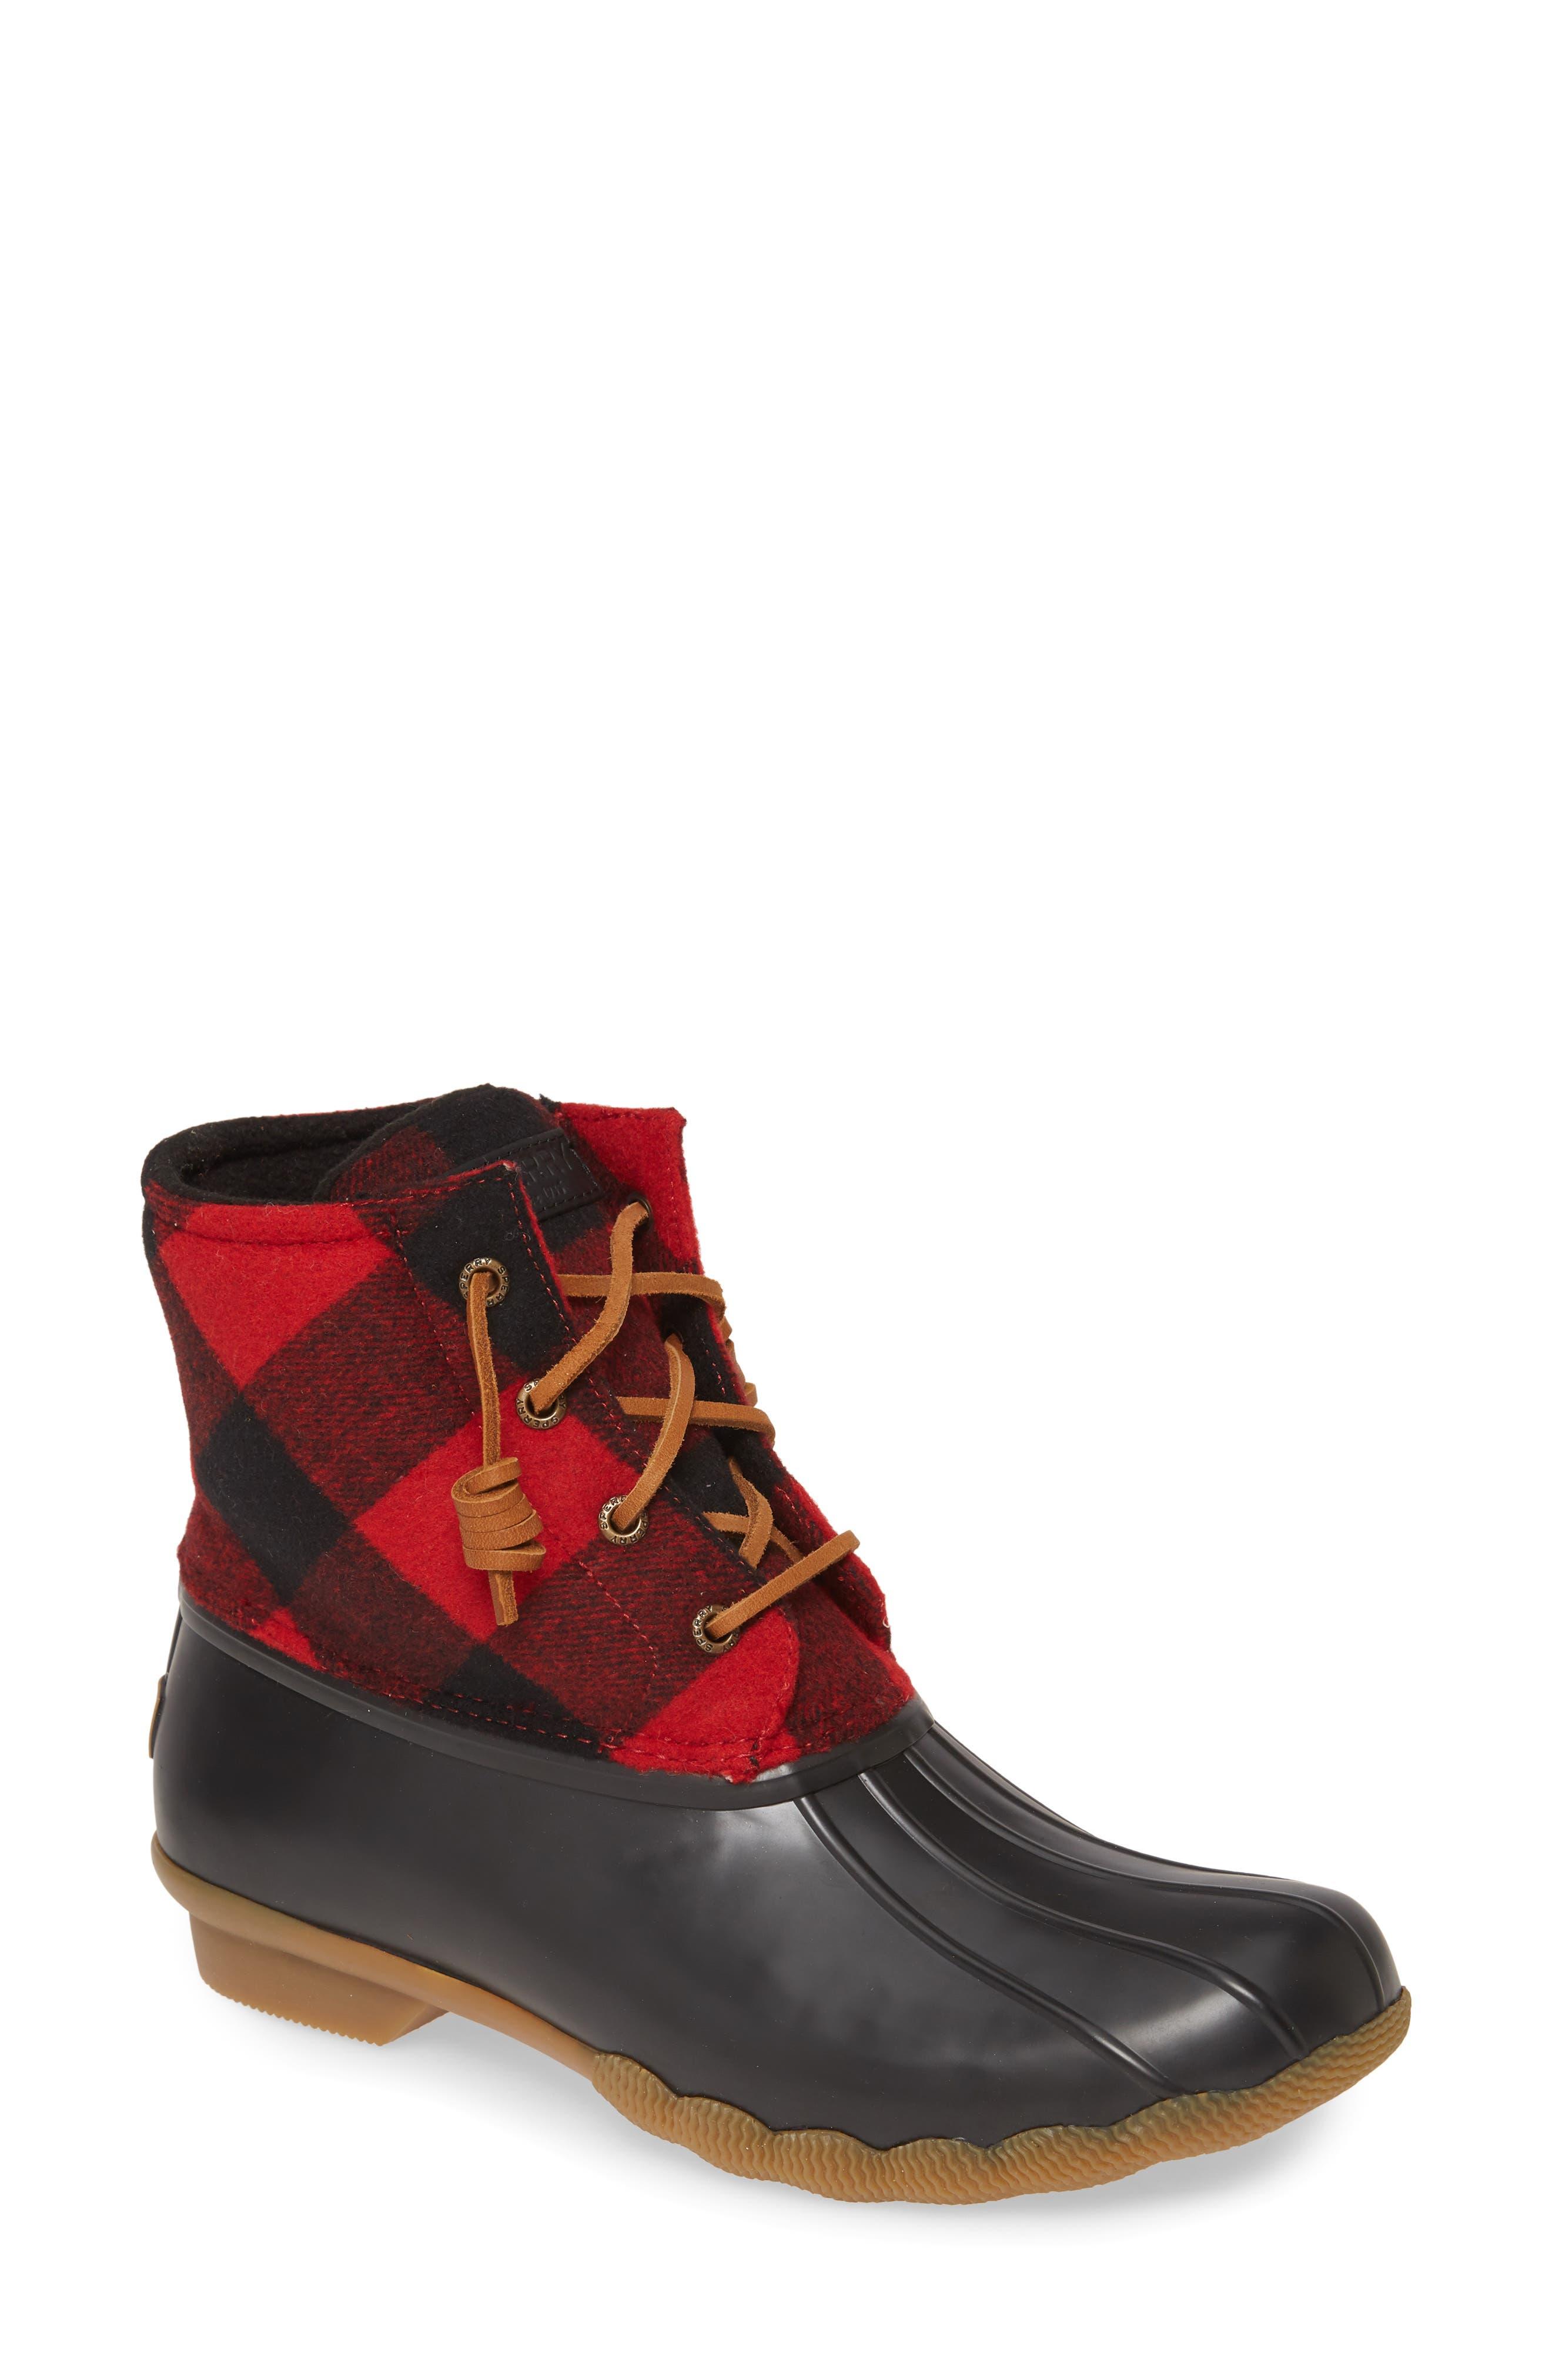 Sperry Saltwater Waterproof Rain Boot (Women)